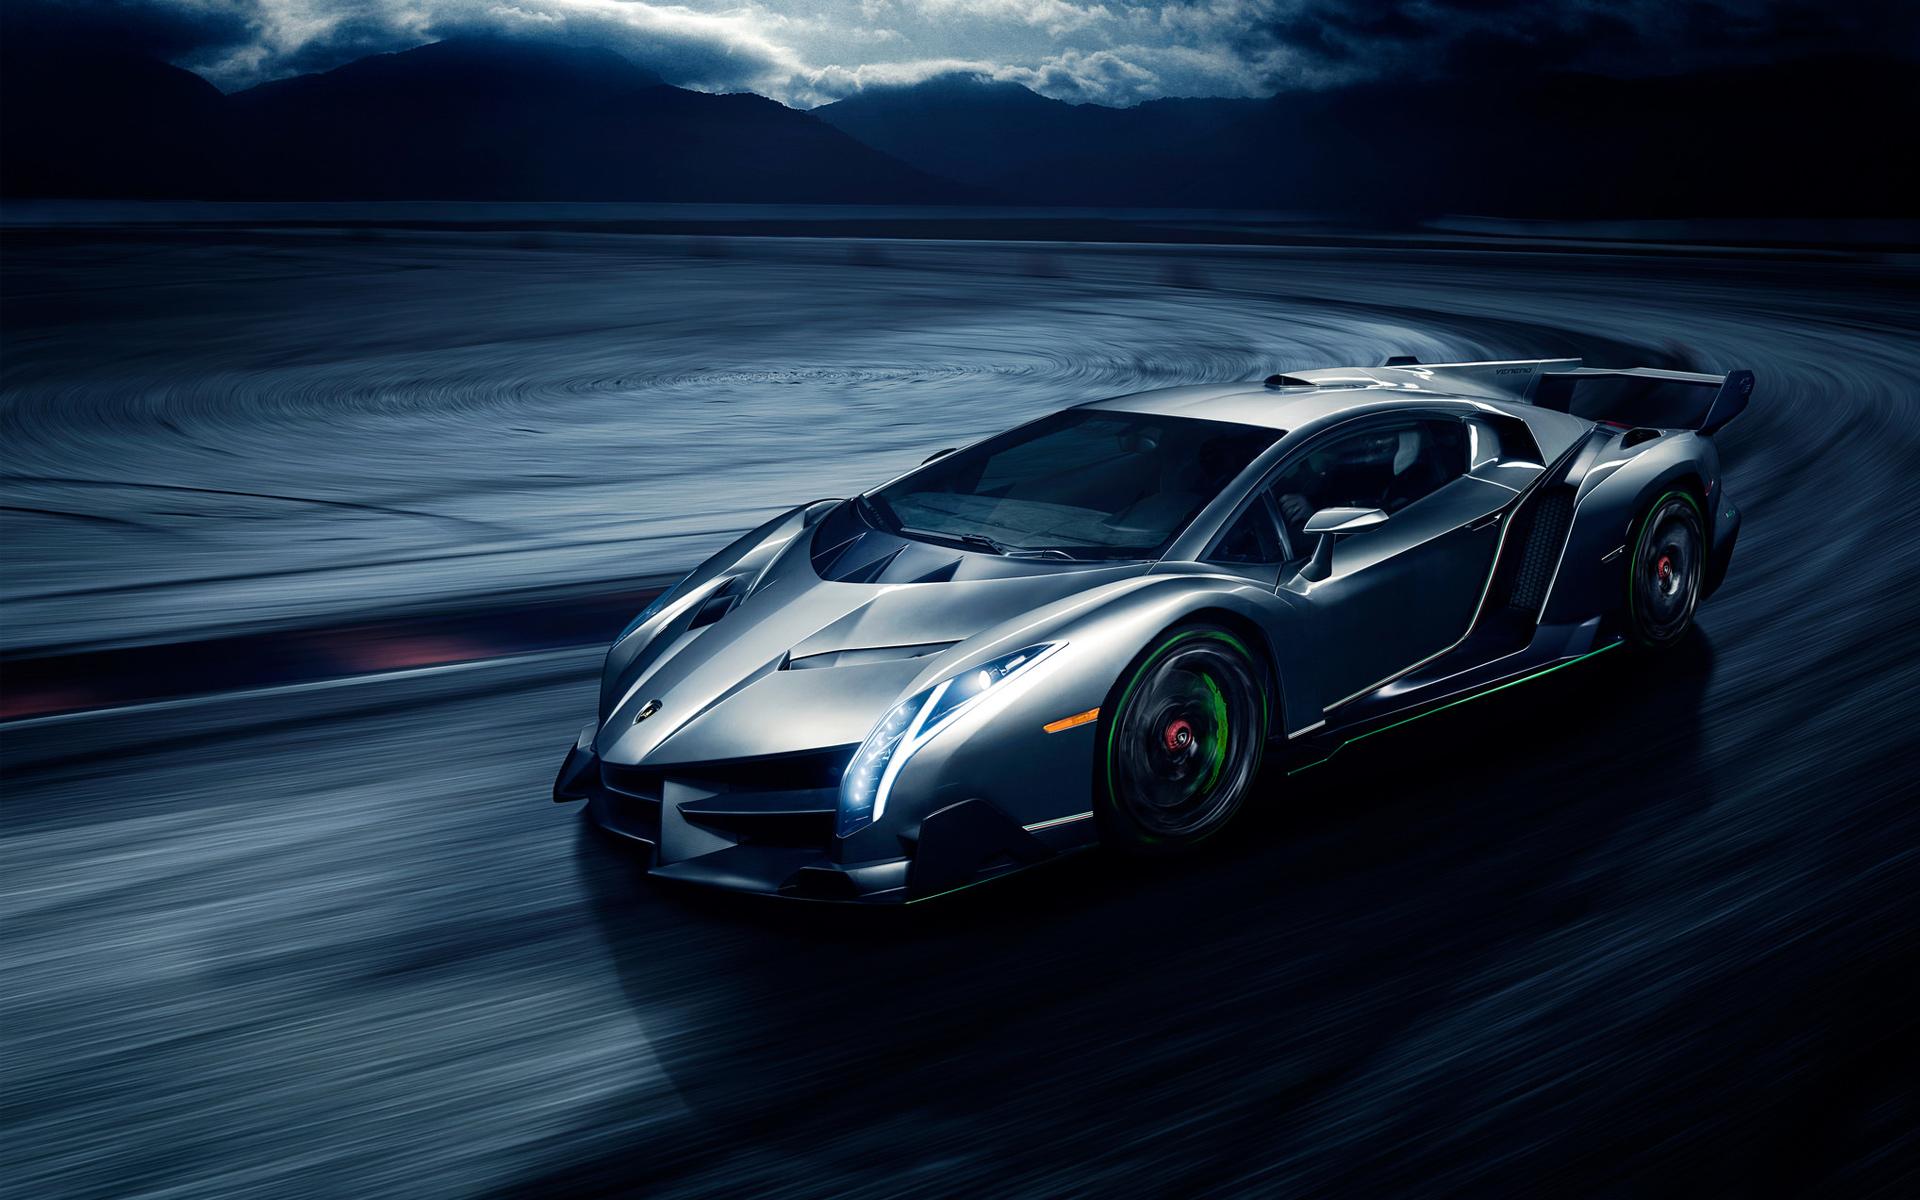 Lamborghini Veneno Supercar Wallpaper Hd Car Wallpapers